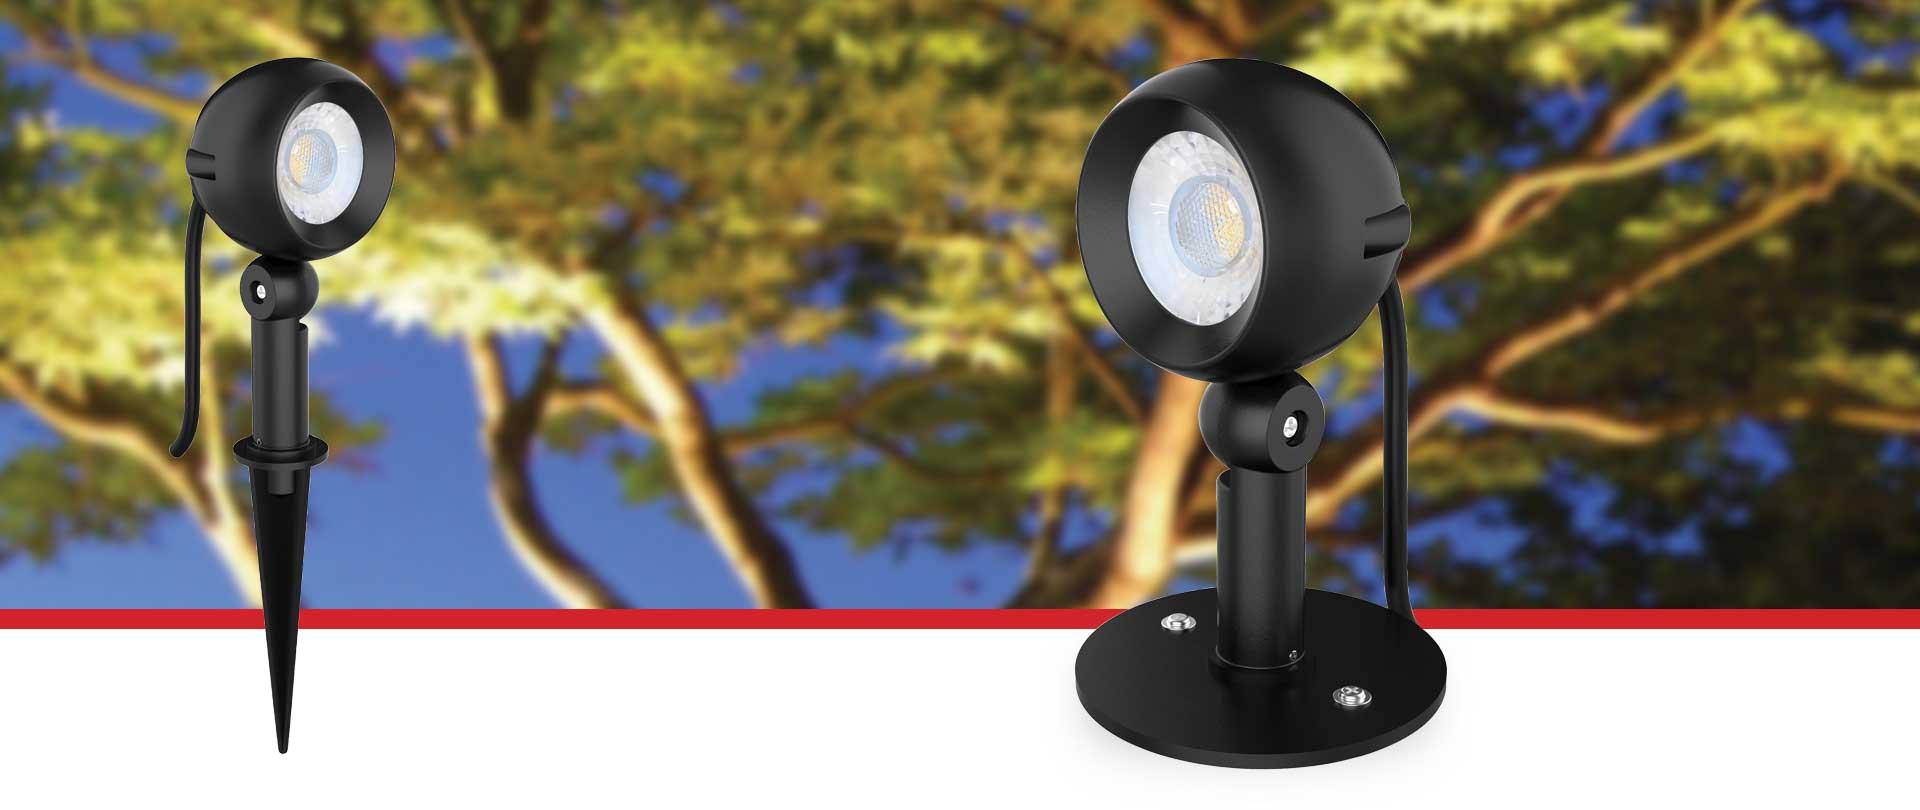 Prelux Holly II Garden Spike /Surface LED Lighting Fitting